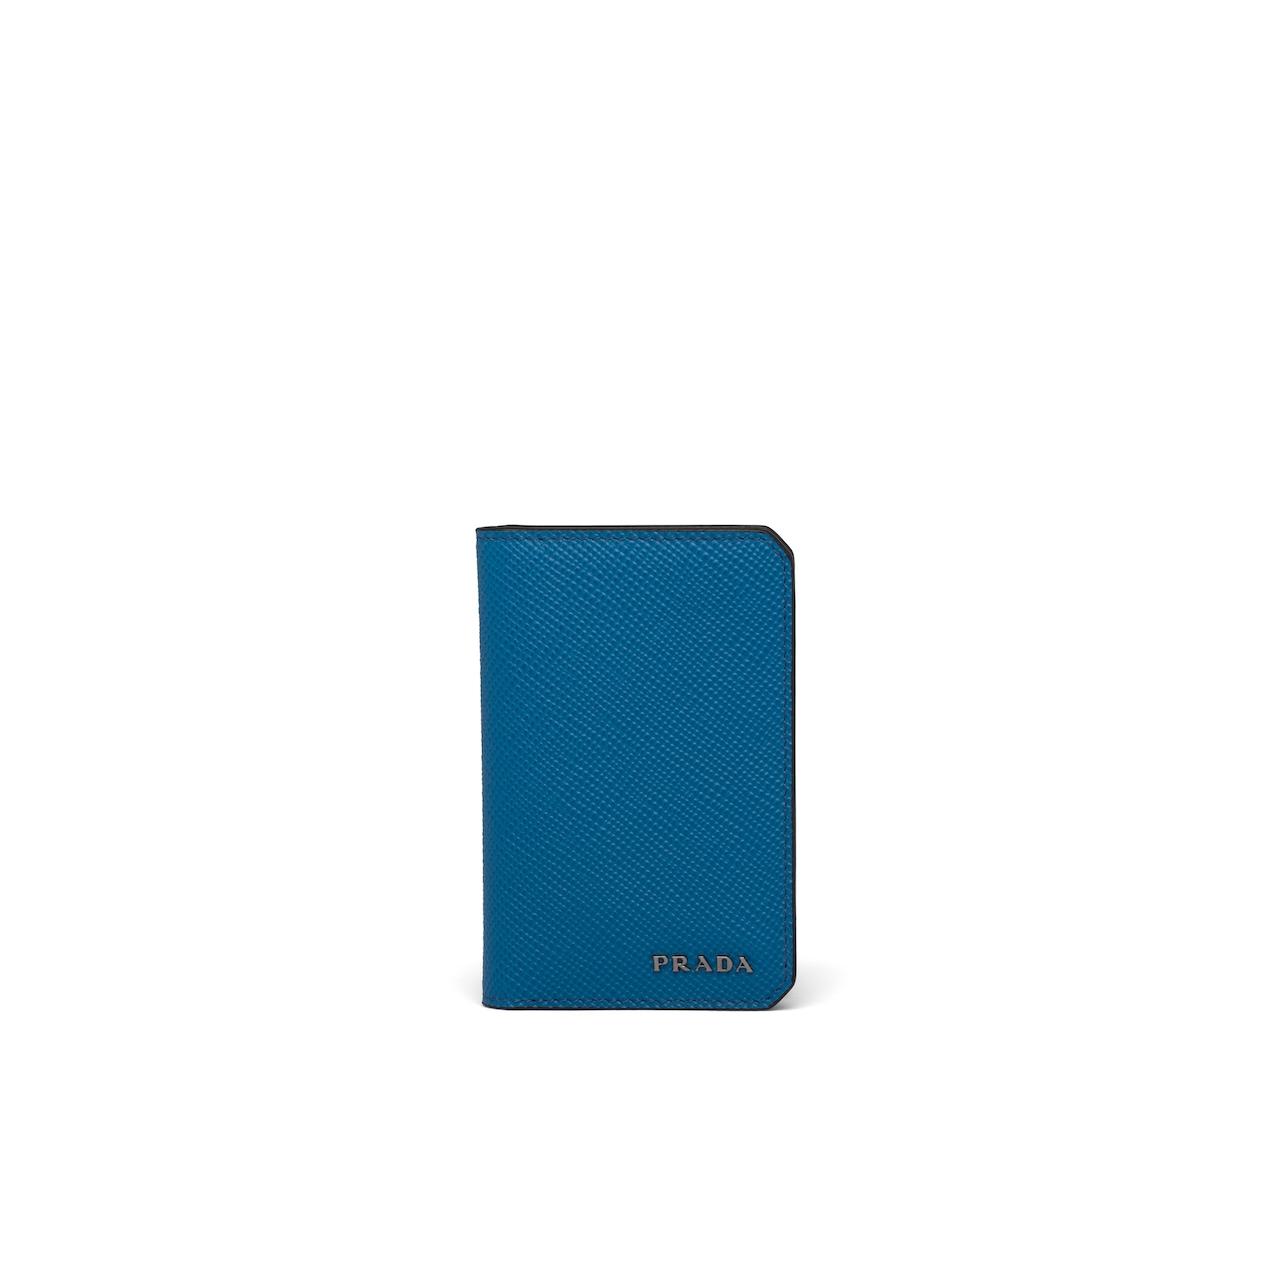 Prada Saffiano Leather Card Holder 1